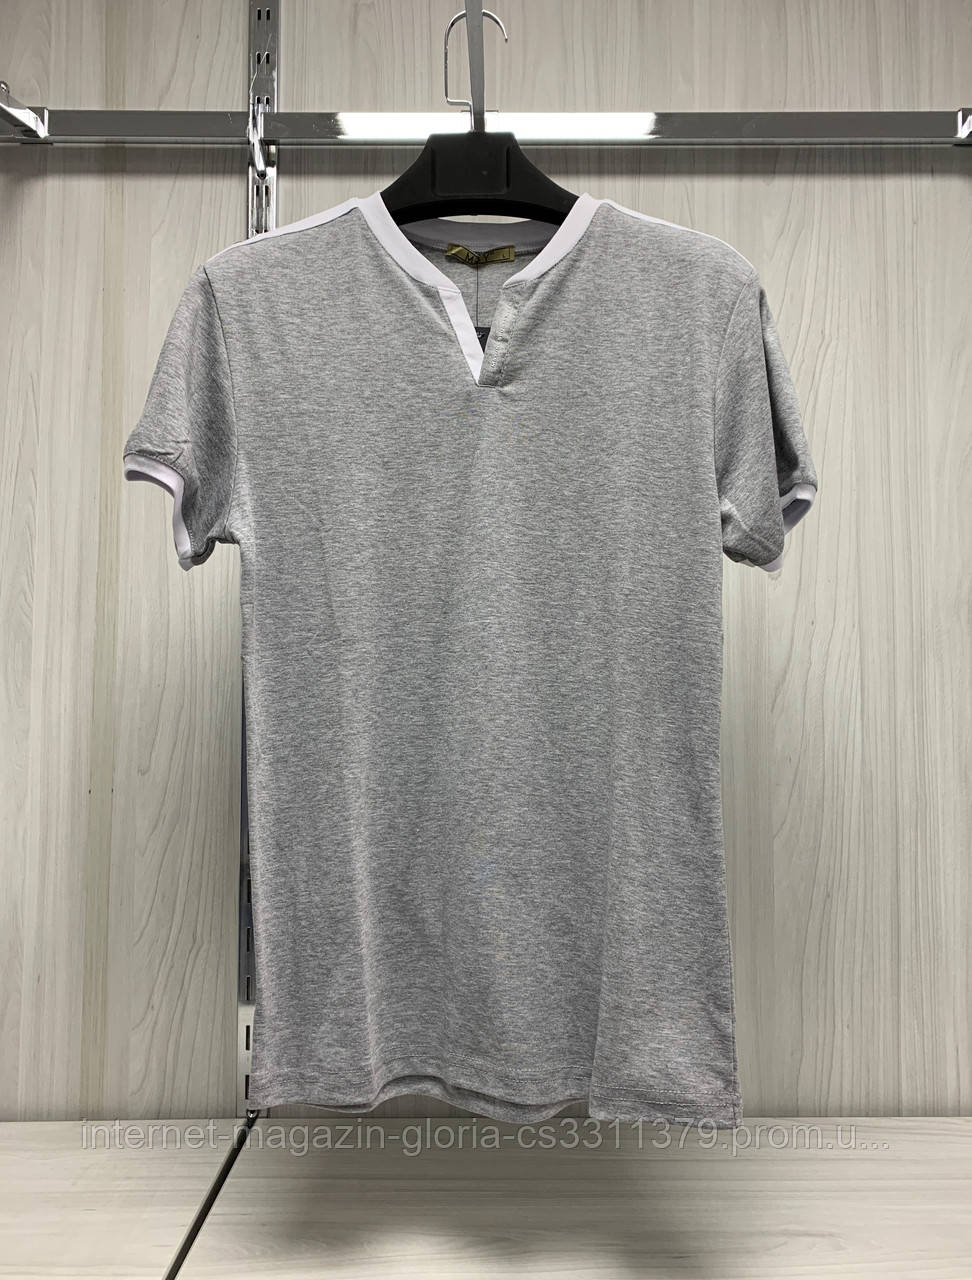 Мужская футболка MSY. 21373-8198(grey-white). Размеры: M,L,XL,XXL,XXXL.